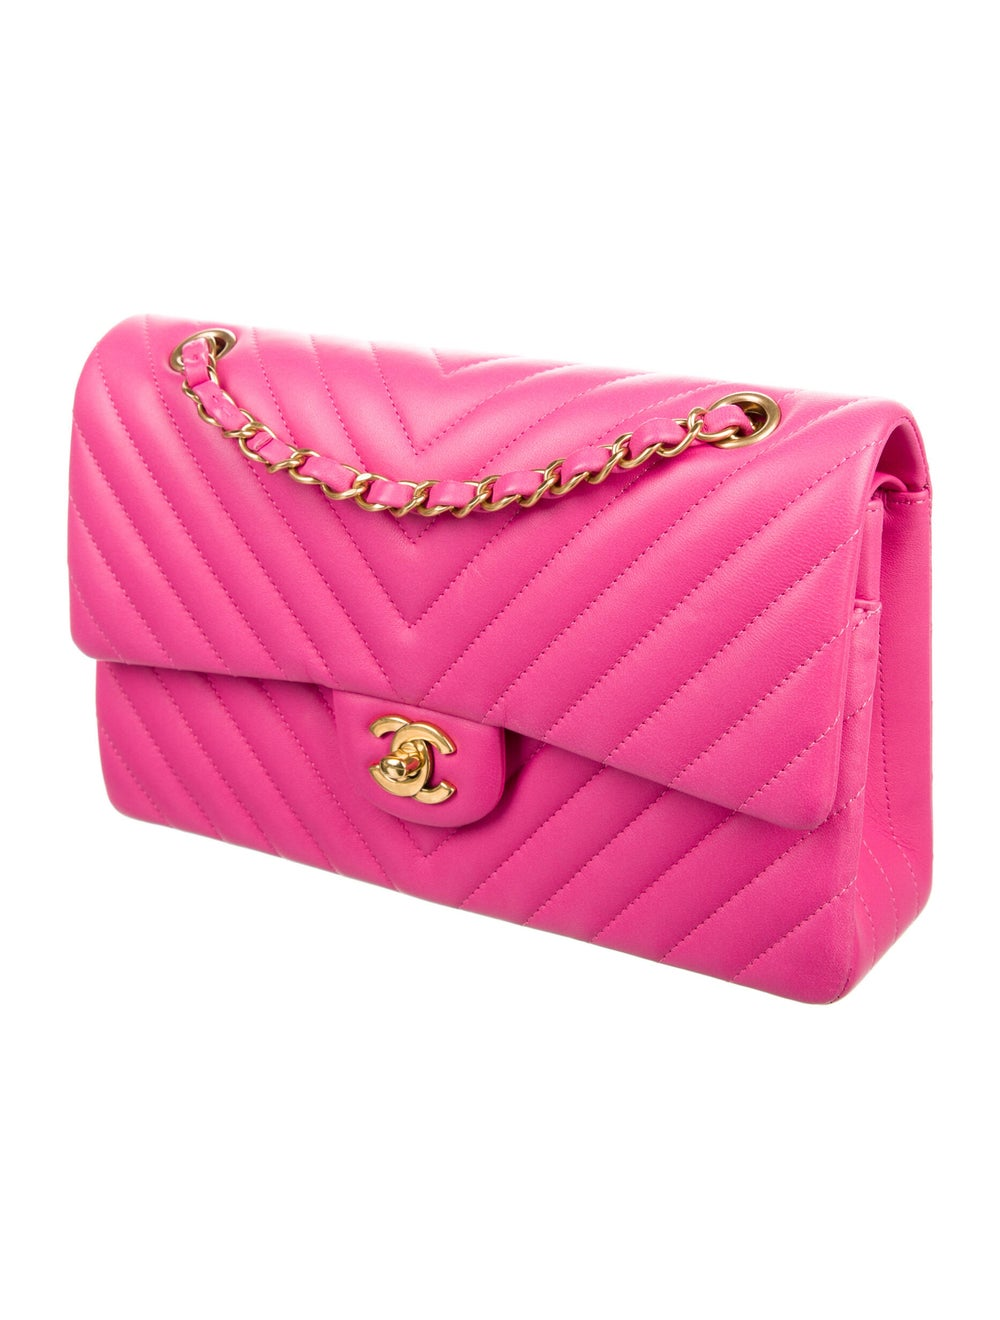 Chanel Chevron Medium Double Flap Bag Pink - image 3